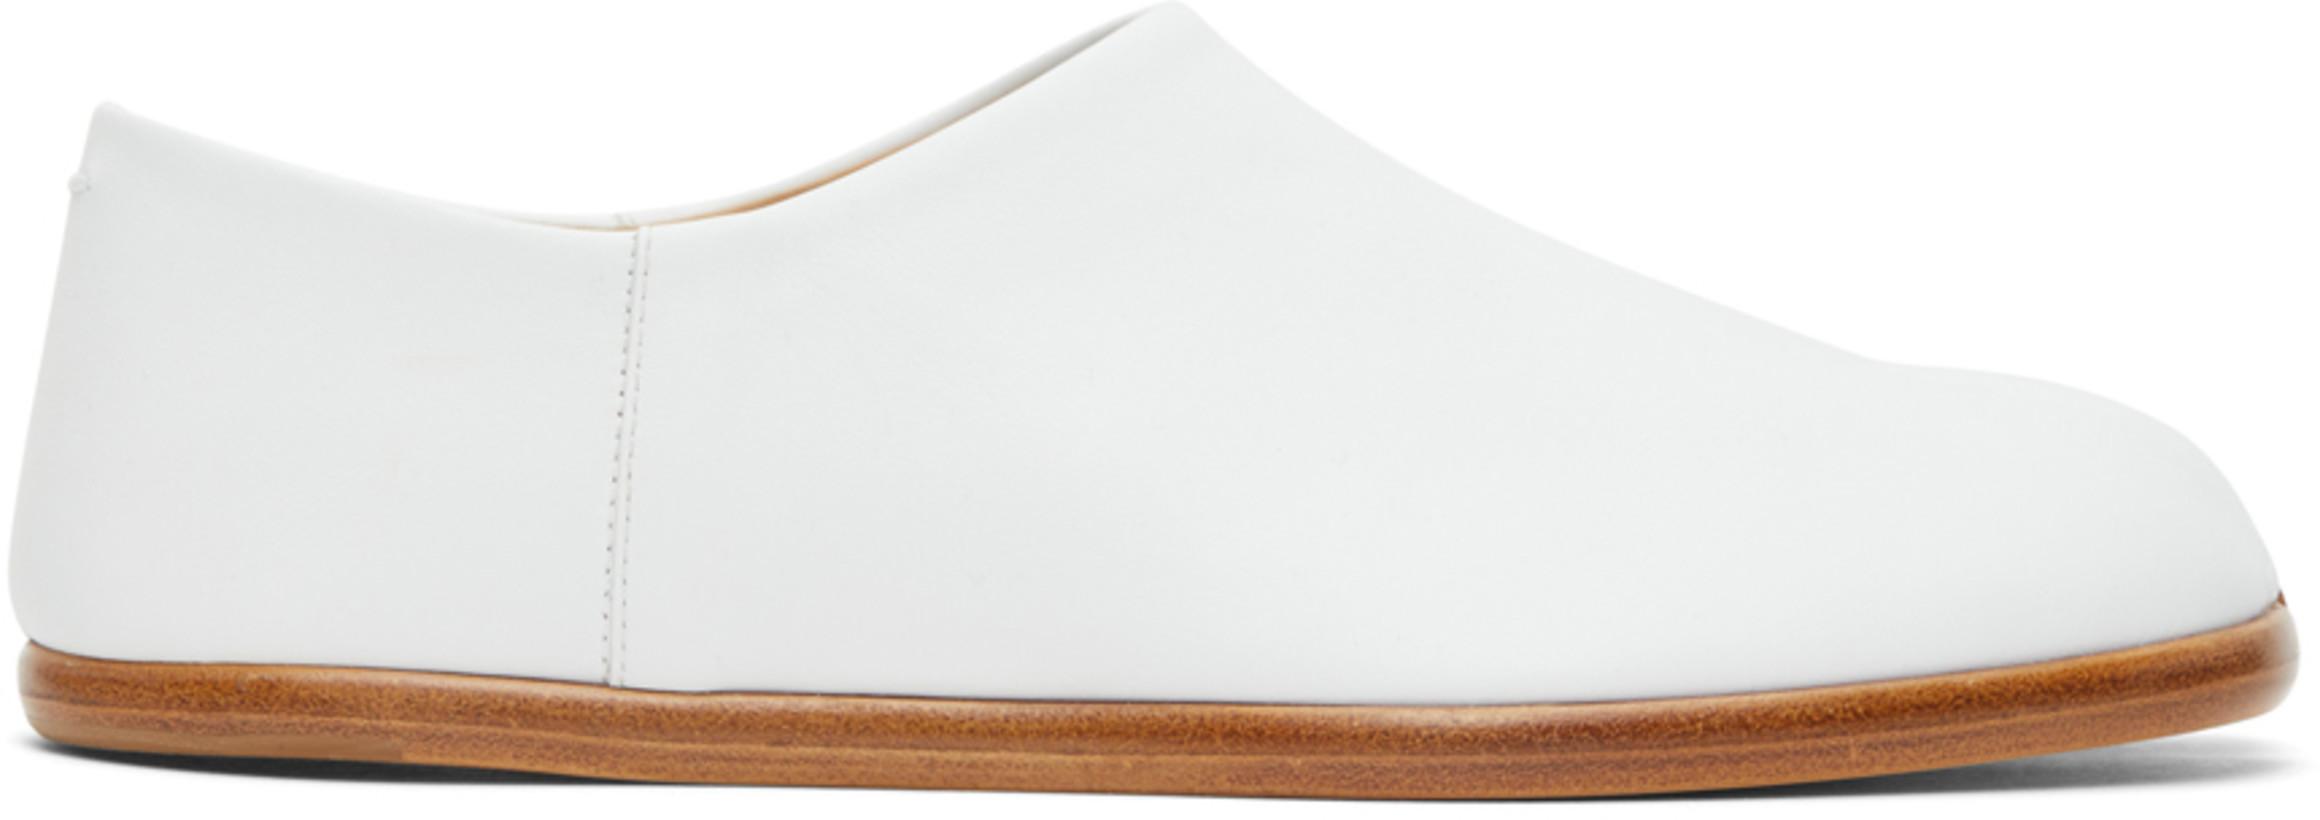 Maison Margiela White Tabi Babouche Loafers